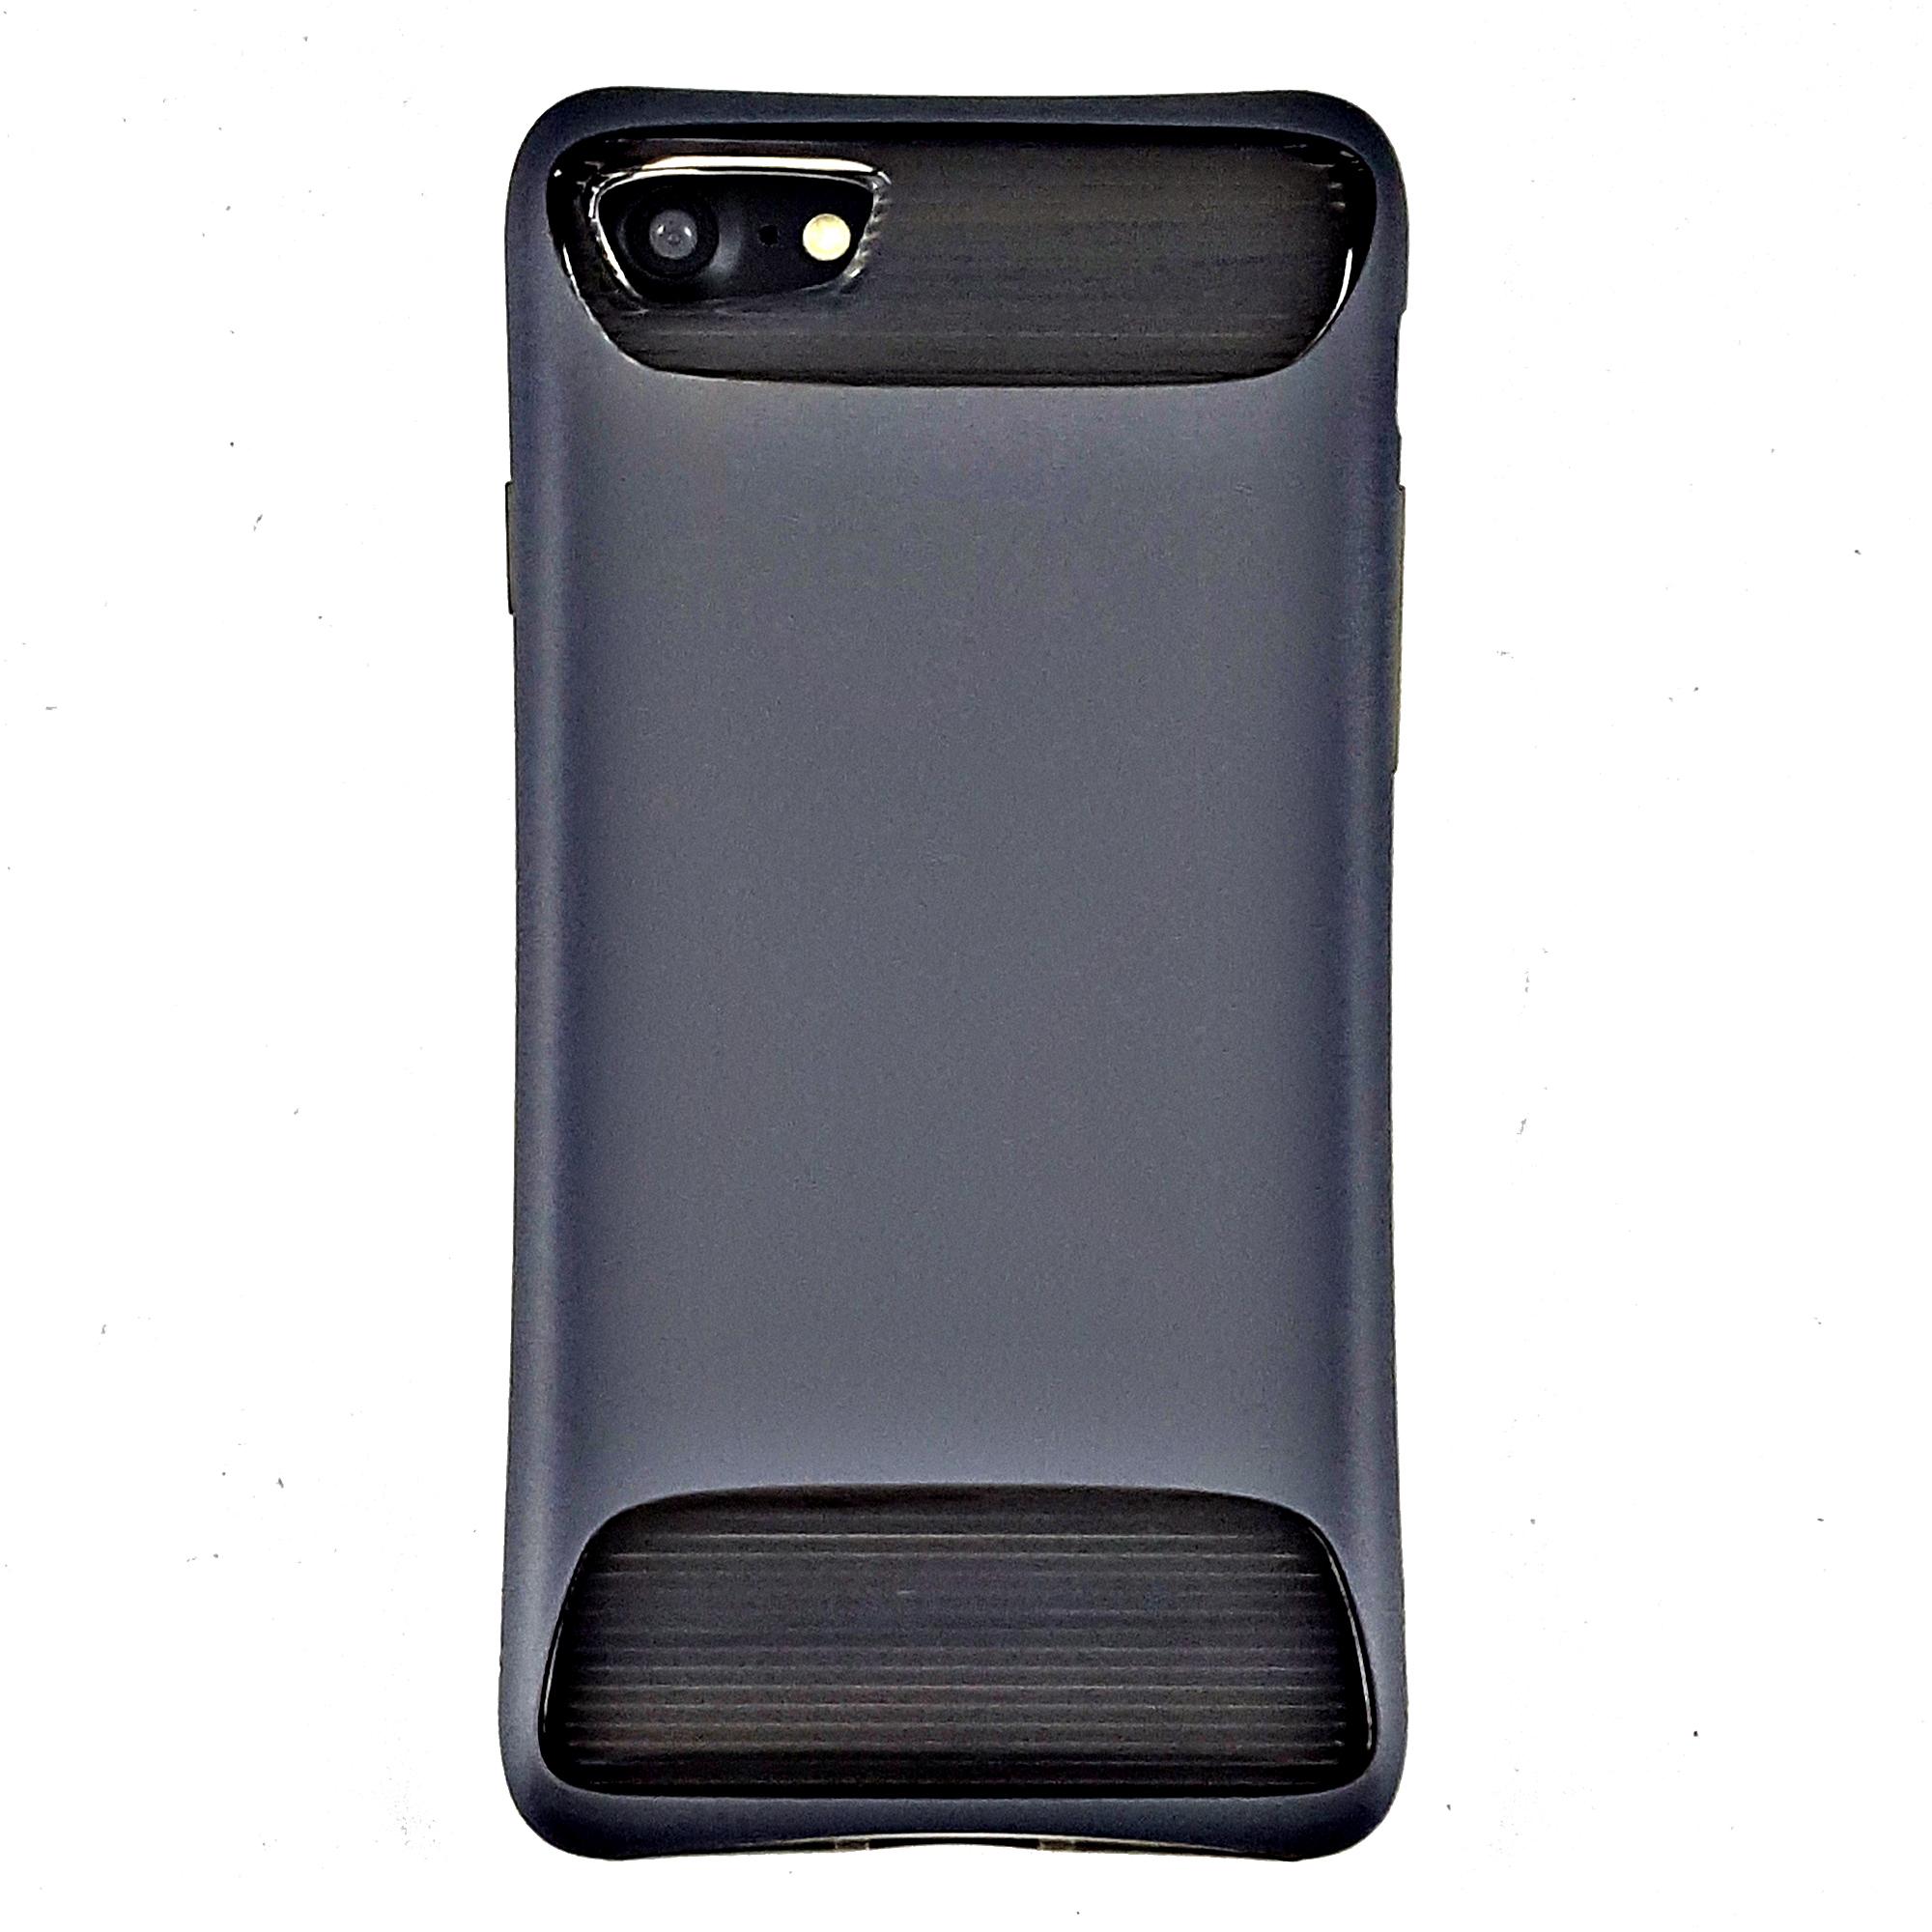 کاور گوشی مدل Angel کد 319 مناسب برای گوشی اپل Iphone 7 / 8